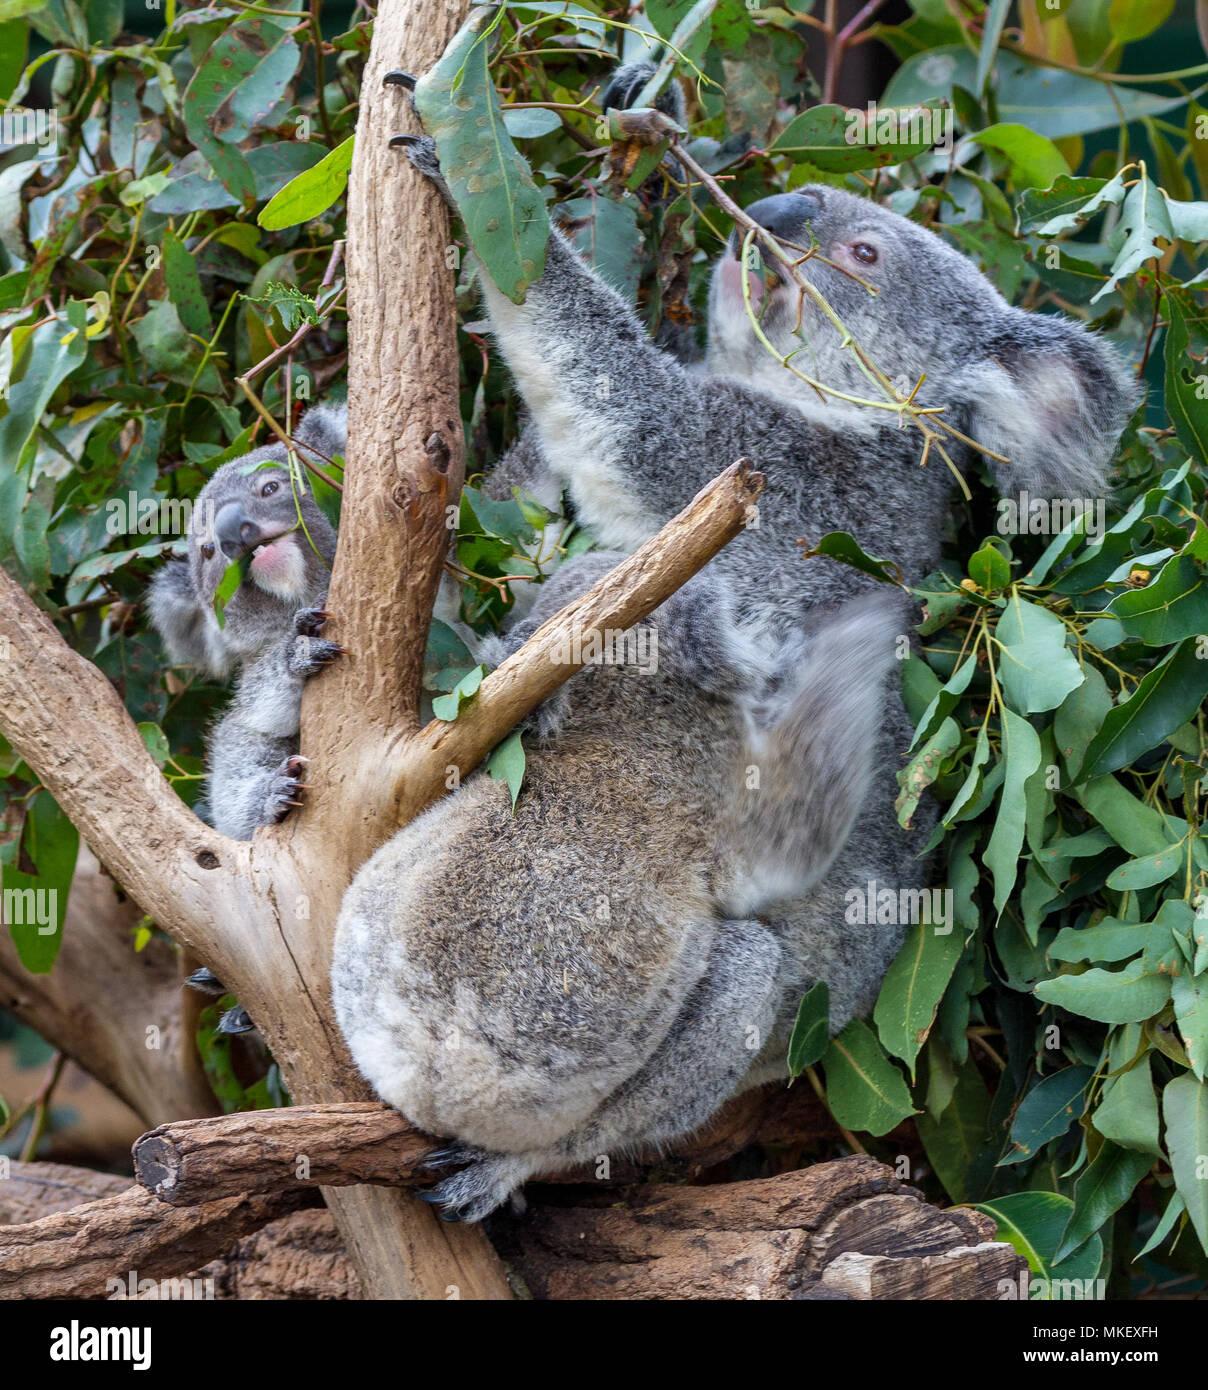 Koala and joey amongst gum leaves - Stock Image